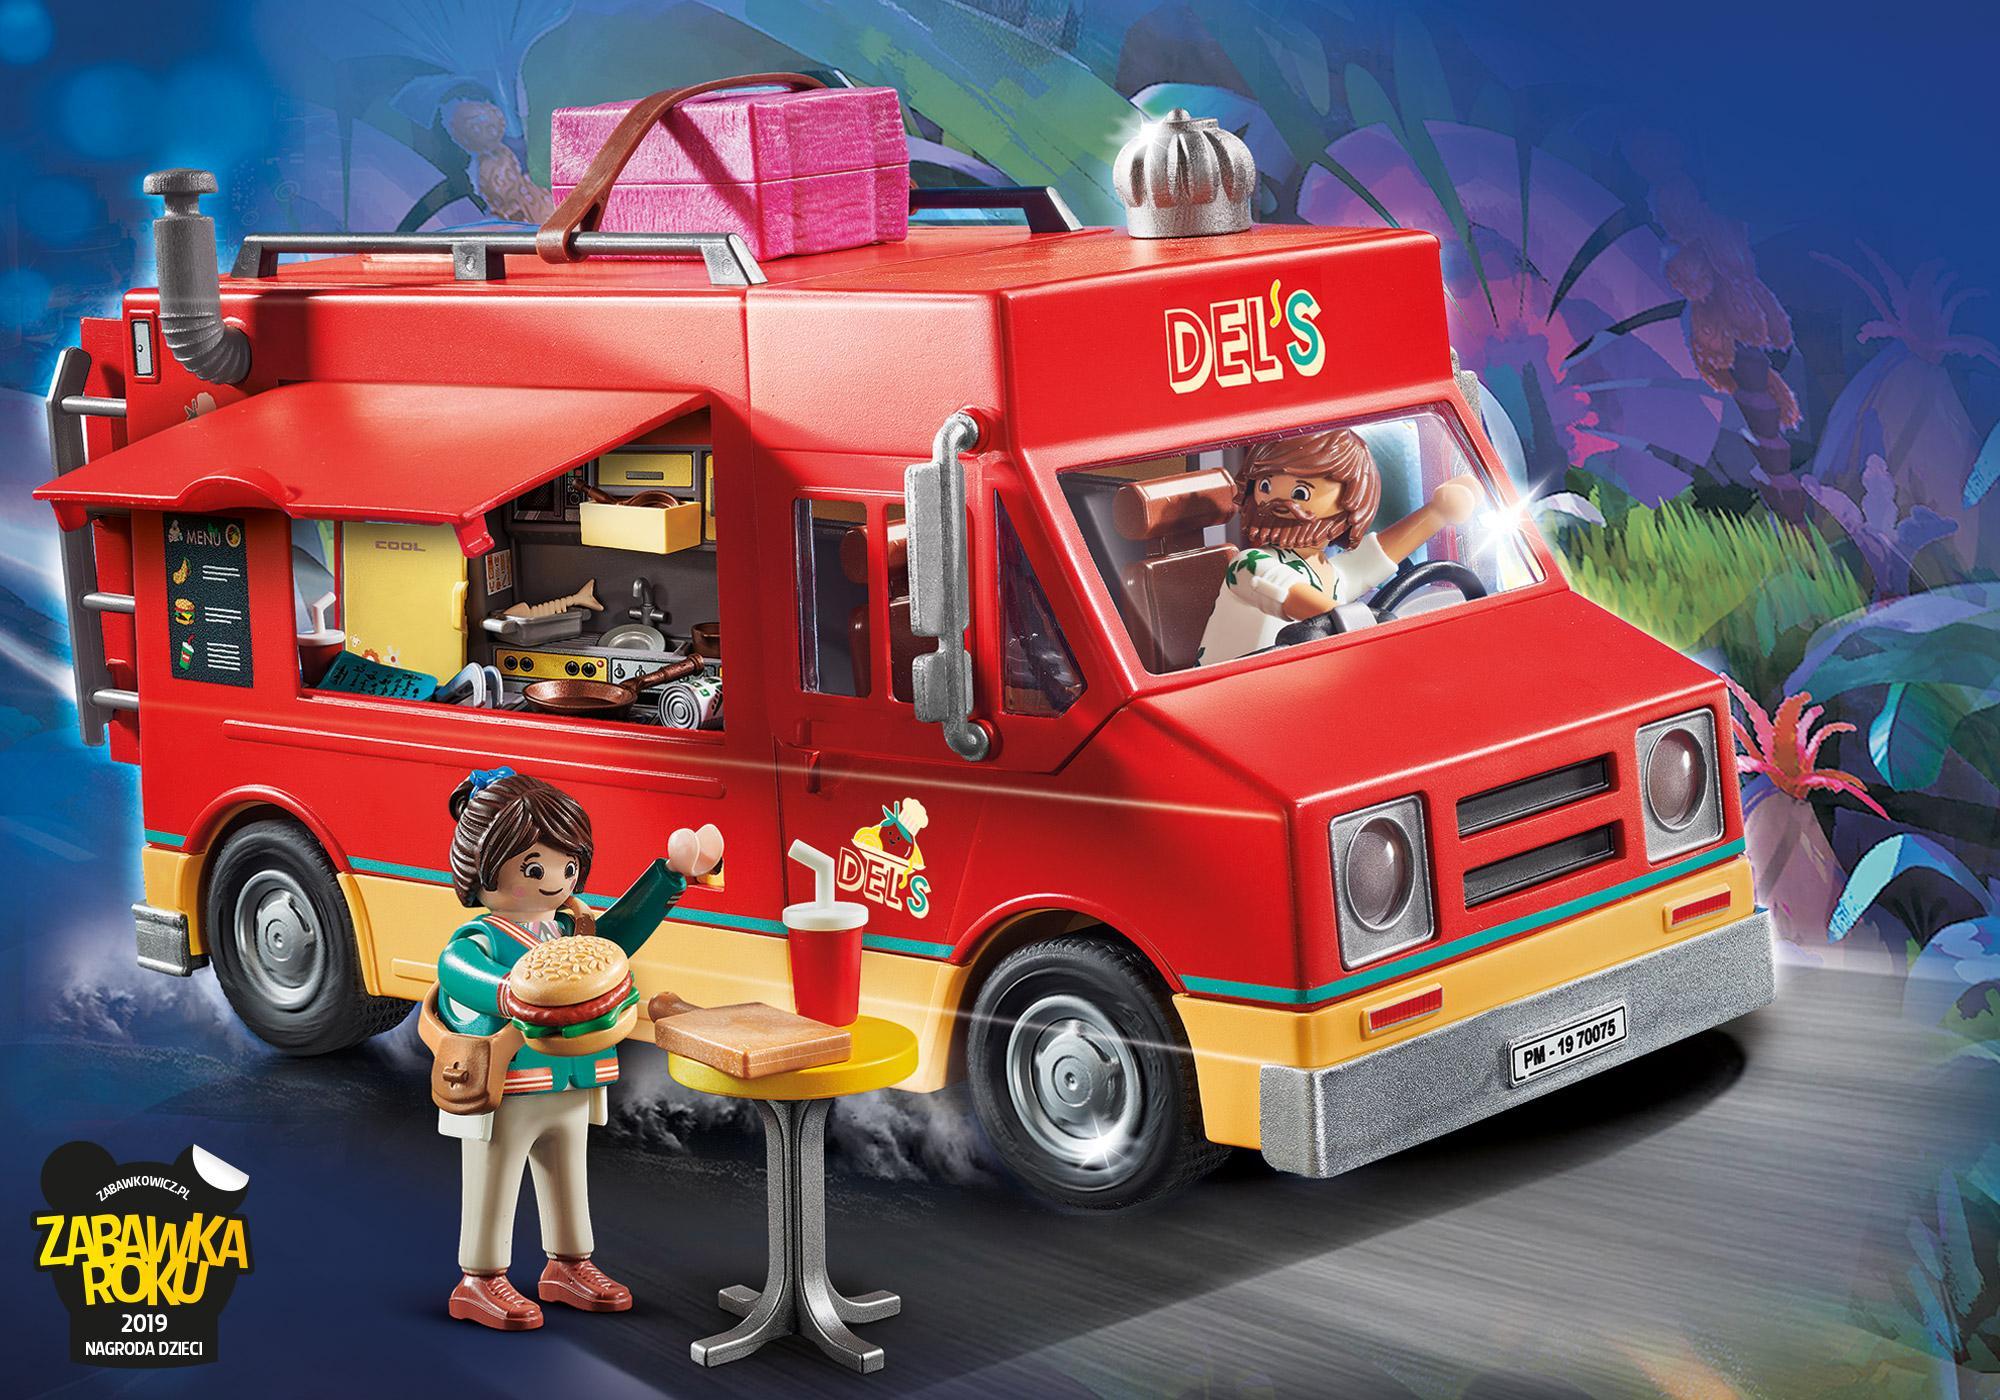 http://media.playmobil.com/i/playmobil/70075_product_detail/PLAYMOBIL: THE MOVIE Food Truck Del'a